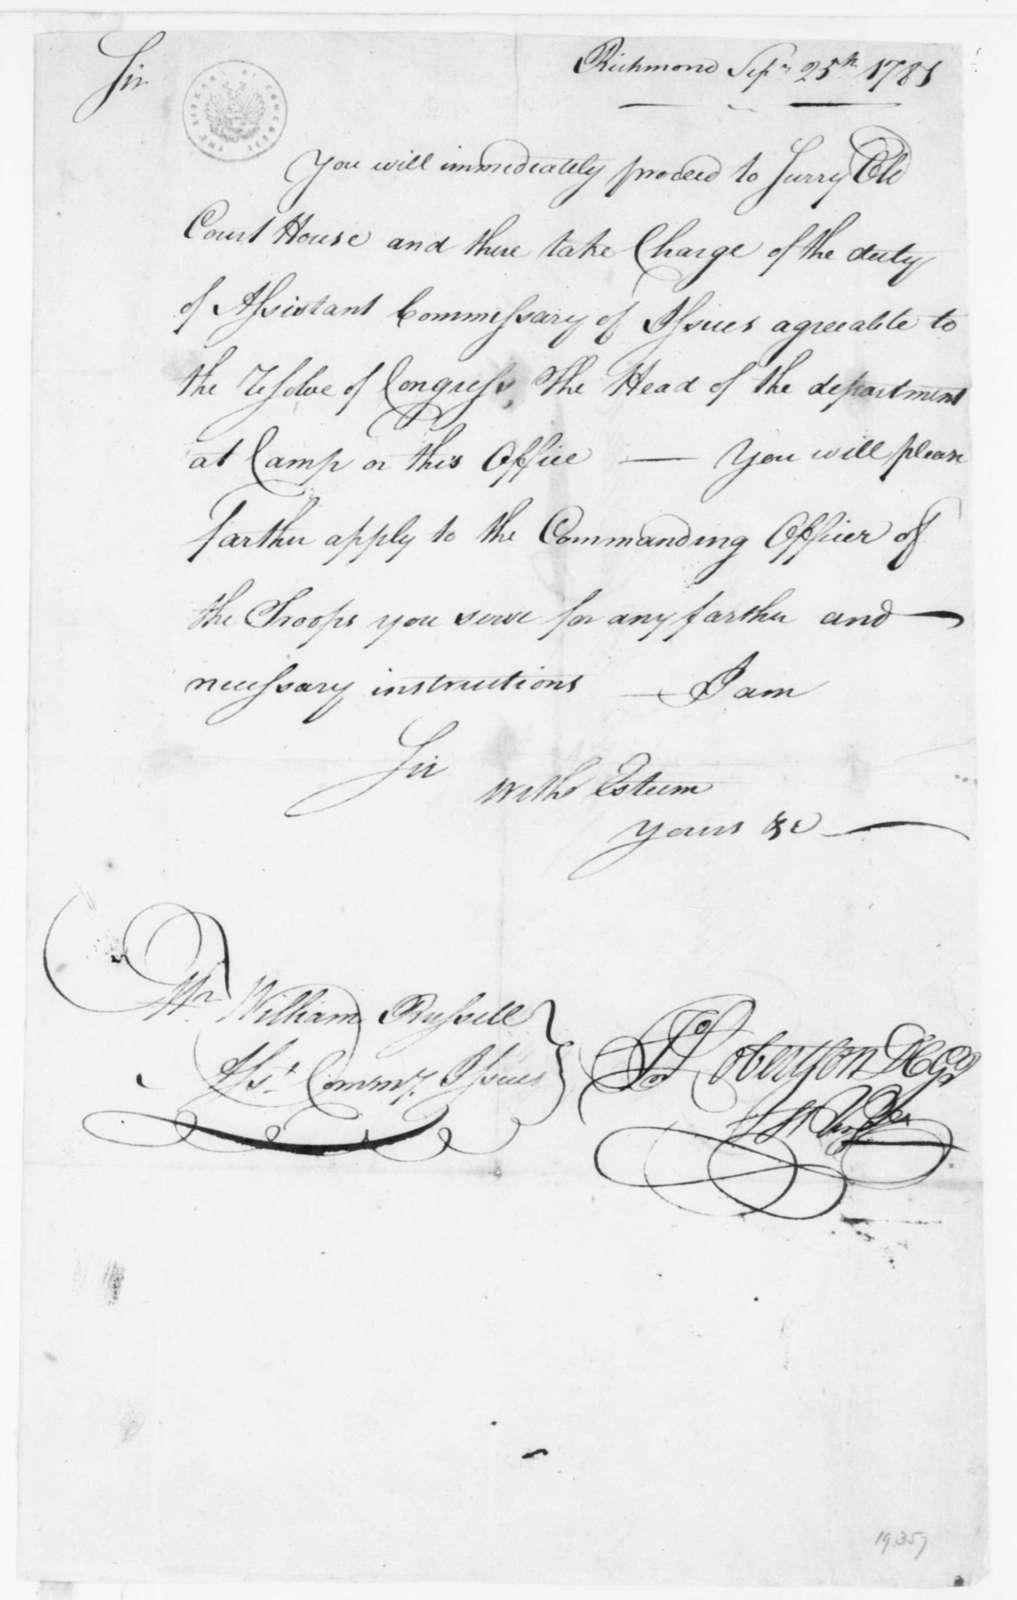 John Robertson to William Russelll, September 25, 1781.